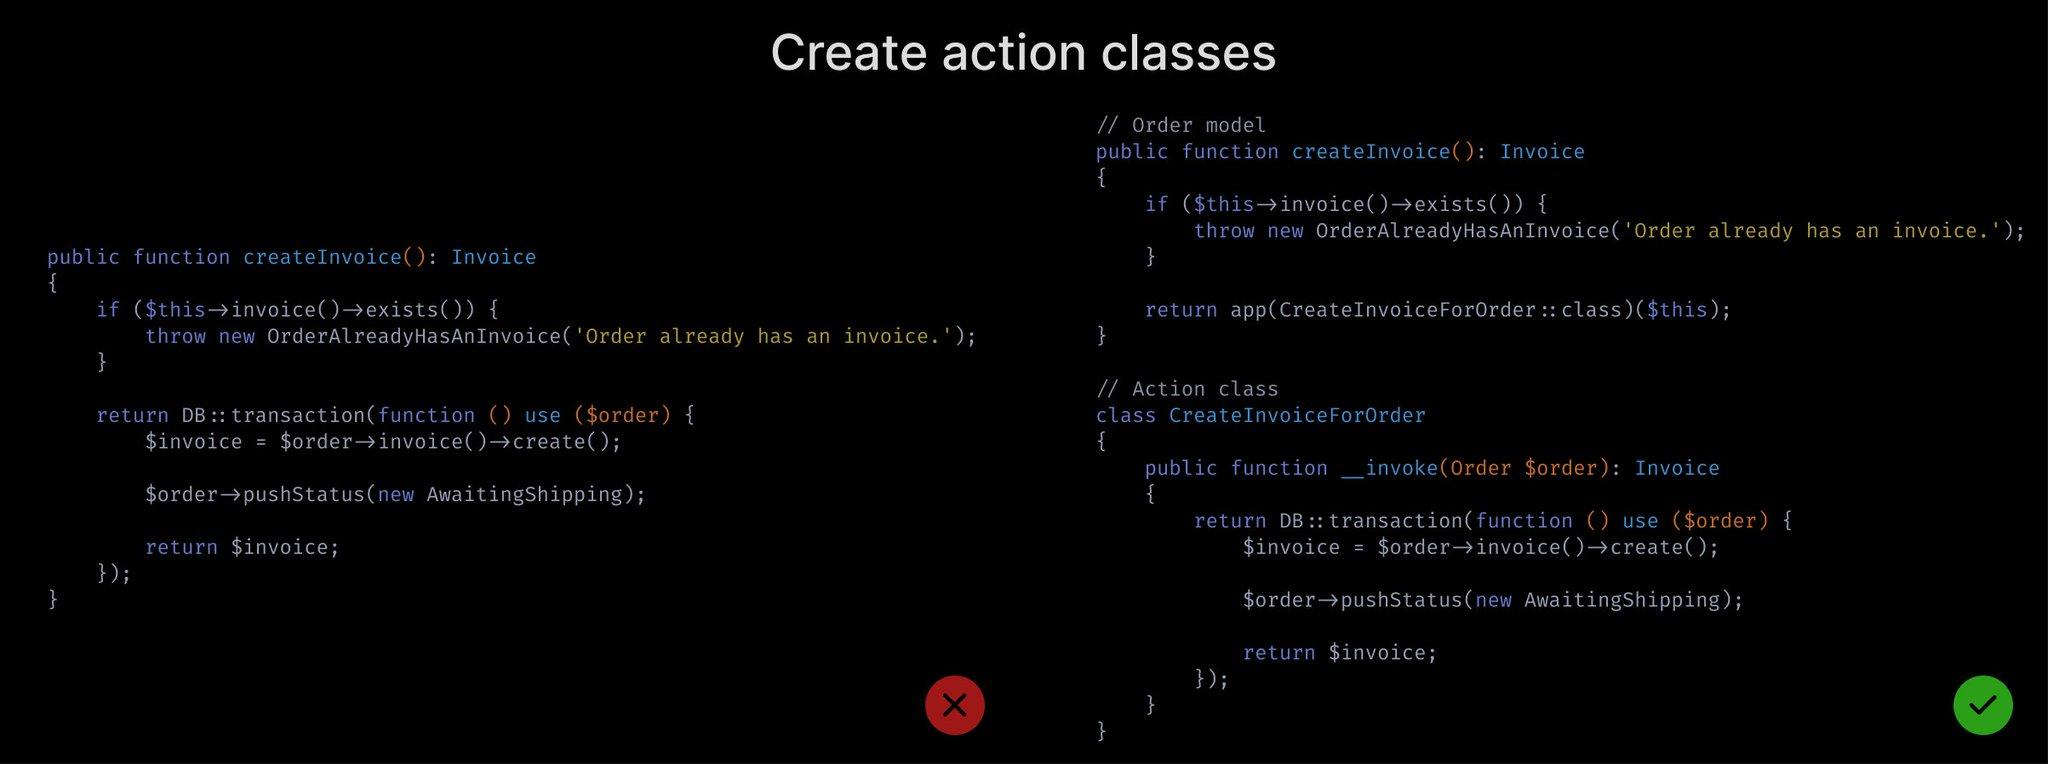 Create action classes